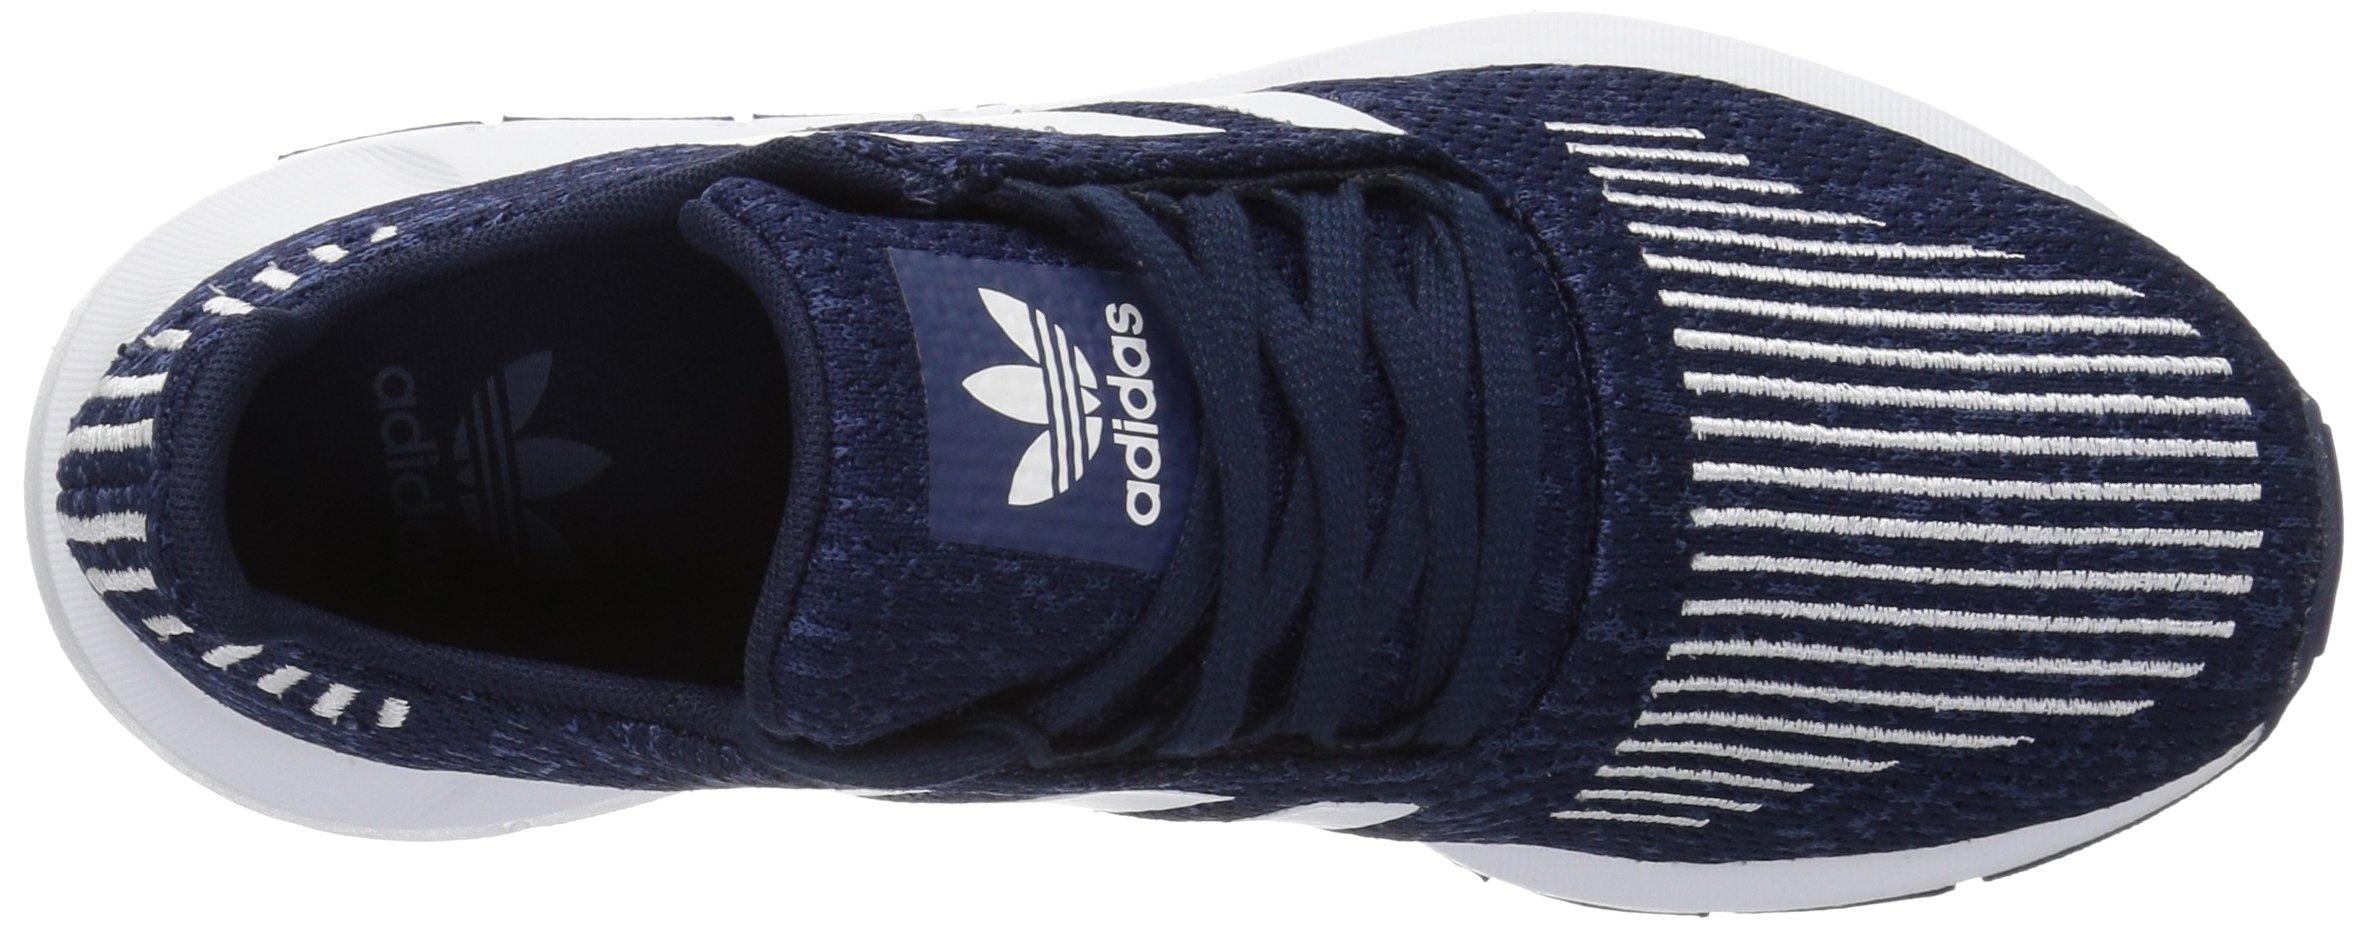 adidas Originals Baby Swift Running Shoe, Collegiate Navy/White/Mystery Blue, 4K M US Toddler by adidas Originals (Image #7)